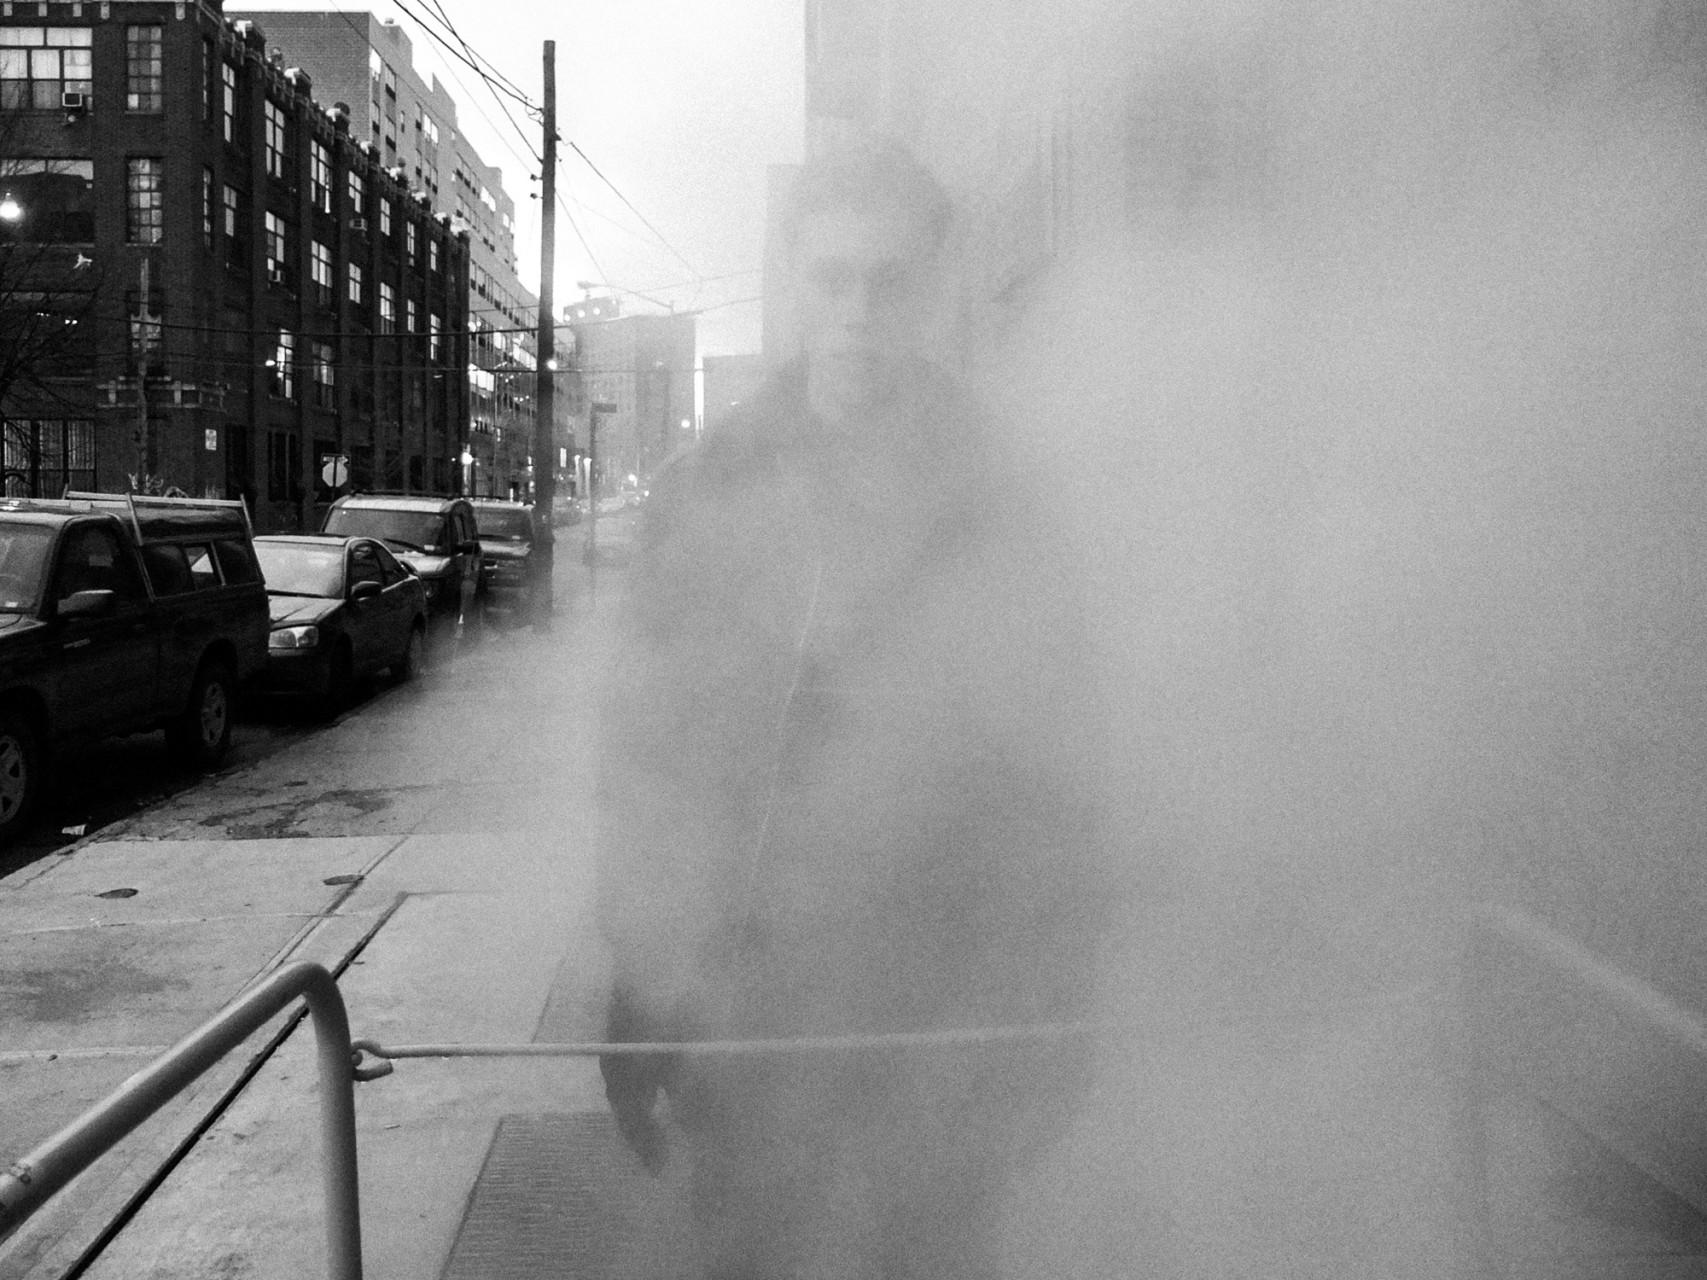 AVANTGAND - Zoob: Boorklyn, NY 2013